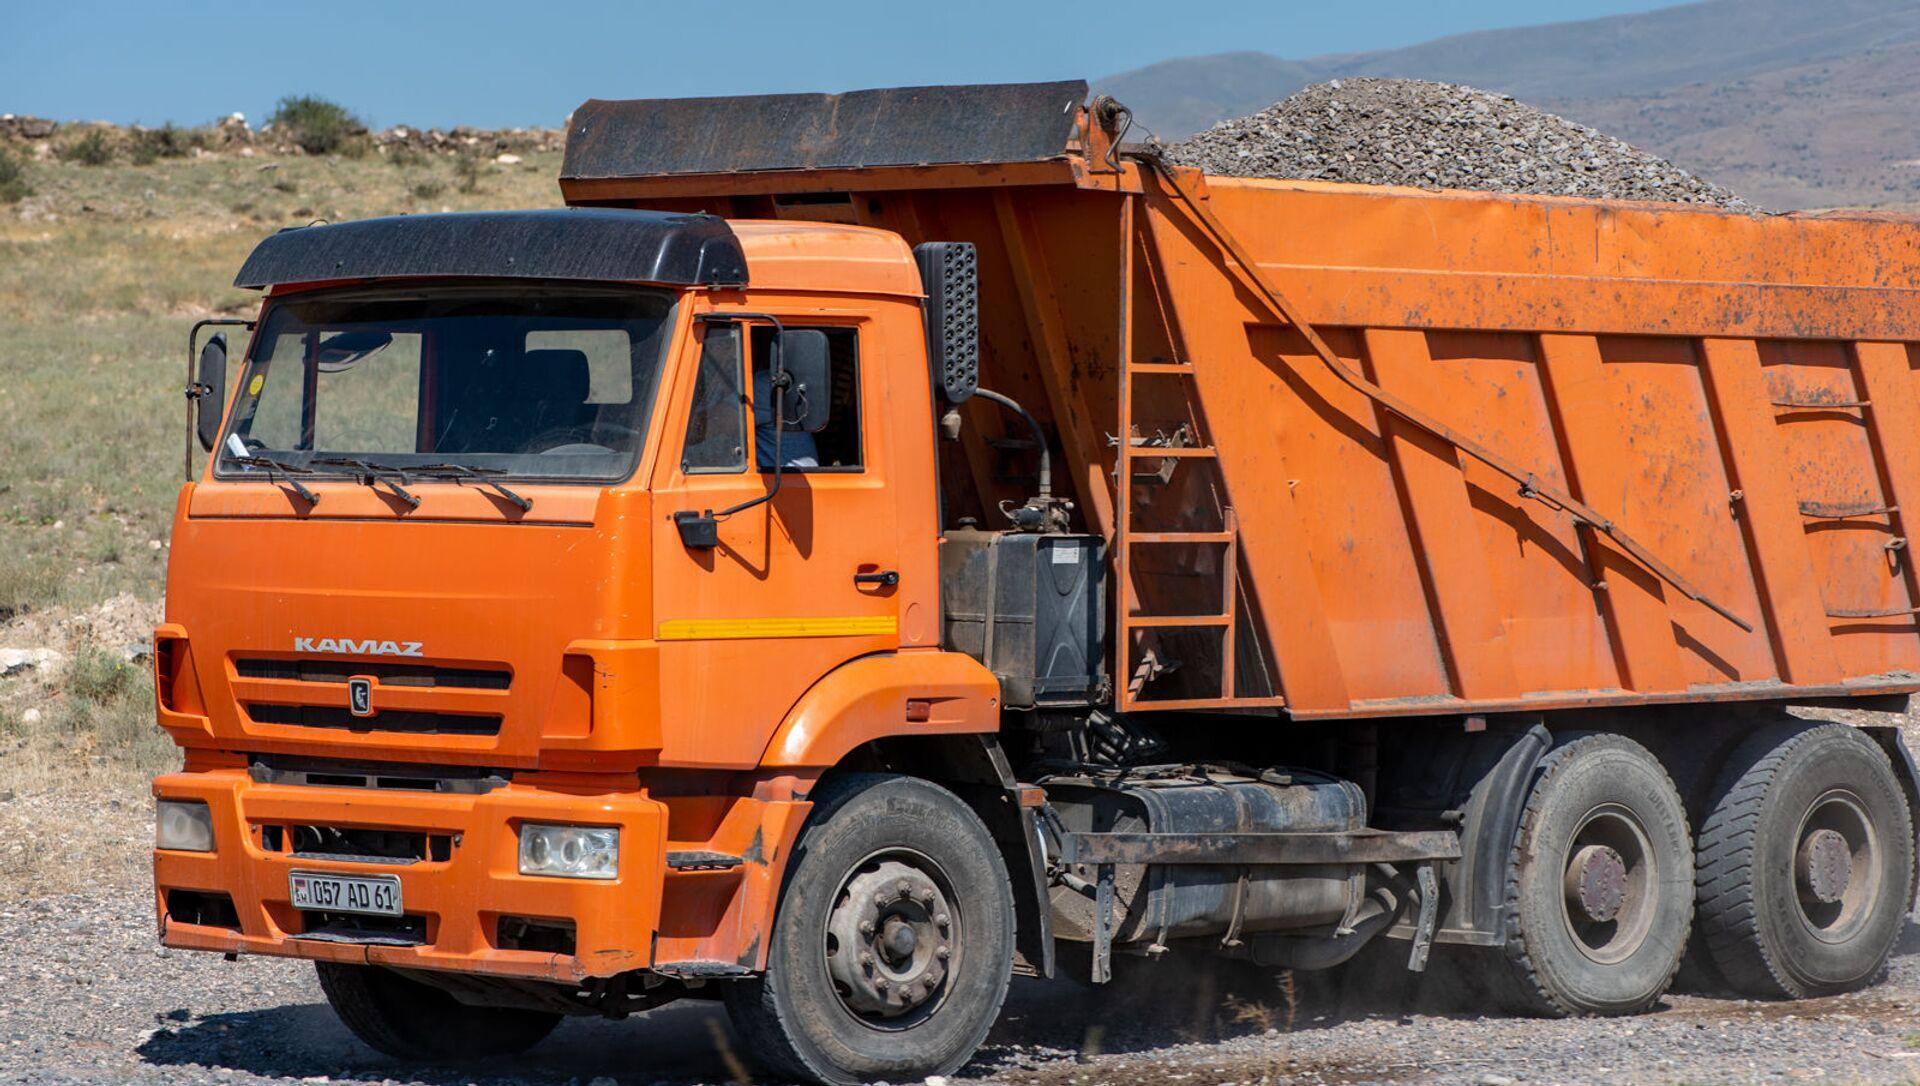 Загруженный щебнем грузовой автомобиль - Sputnik Արմենիա, 1920, 23.08.2021